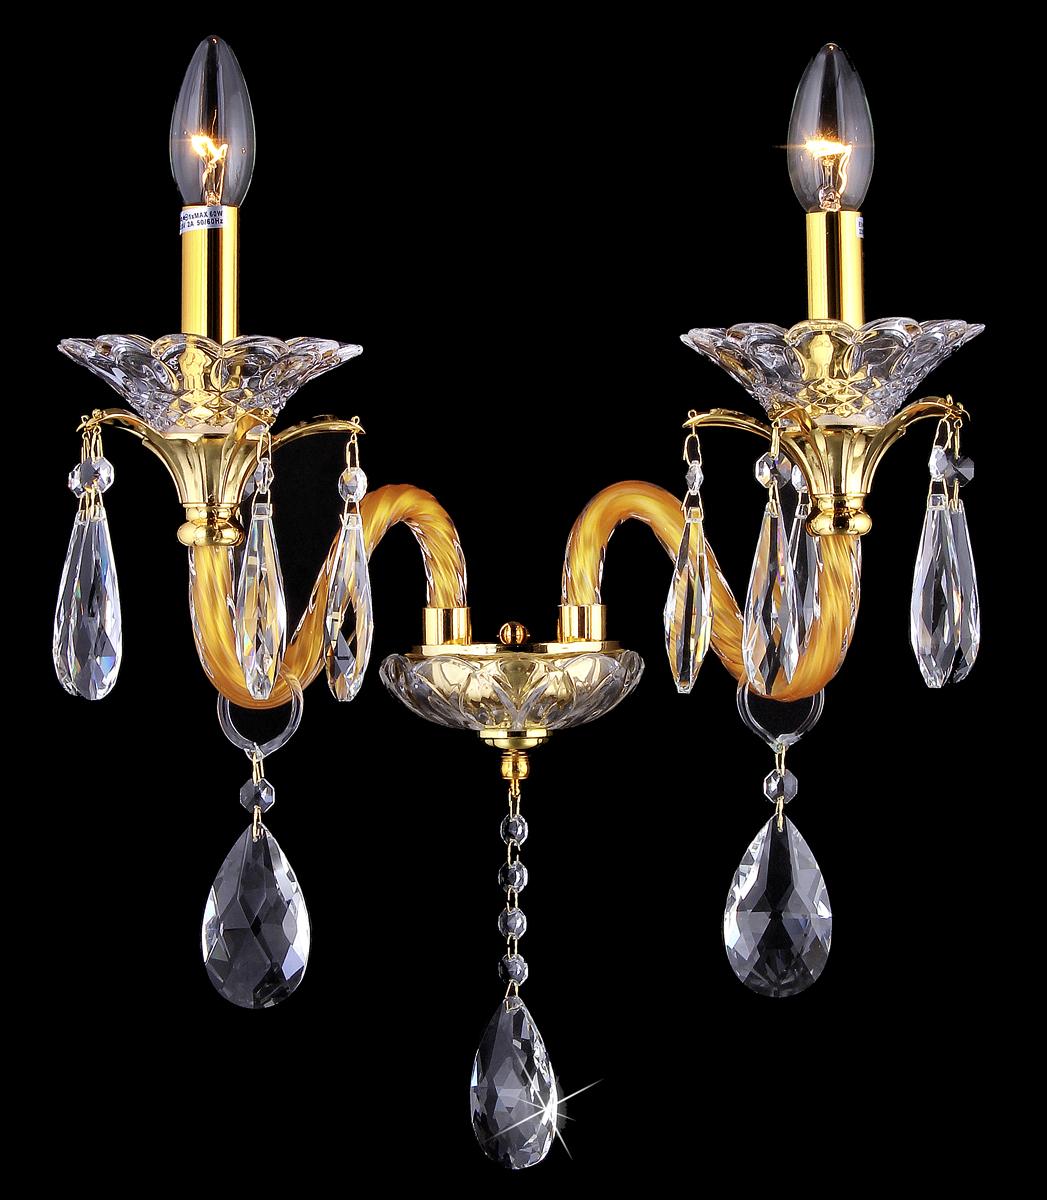 Бра Natali Kovaltseva Tivoli 10653/2W GOLD, CLEARTivoli 10653/2W GOLD, CLEARD32 x H35 cm